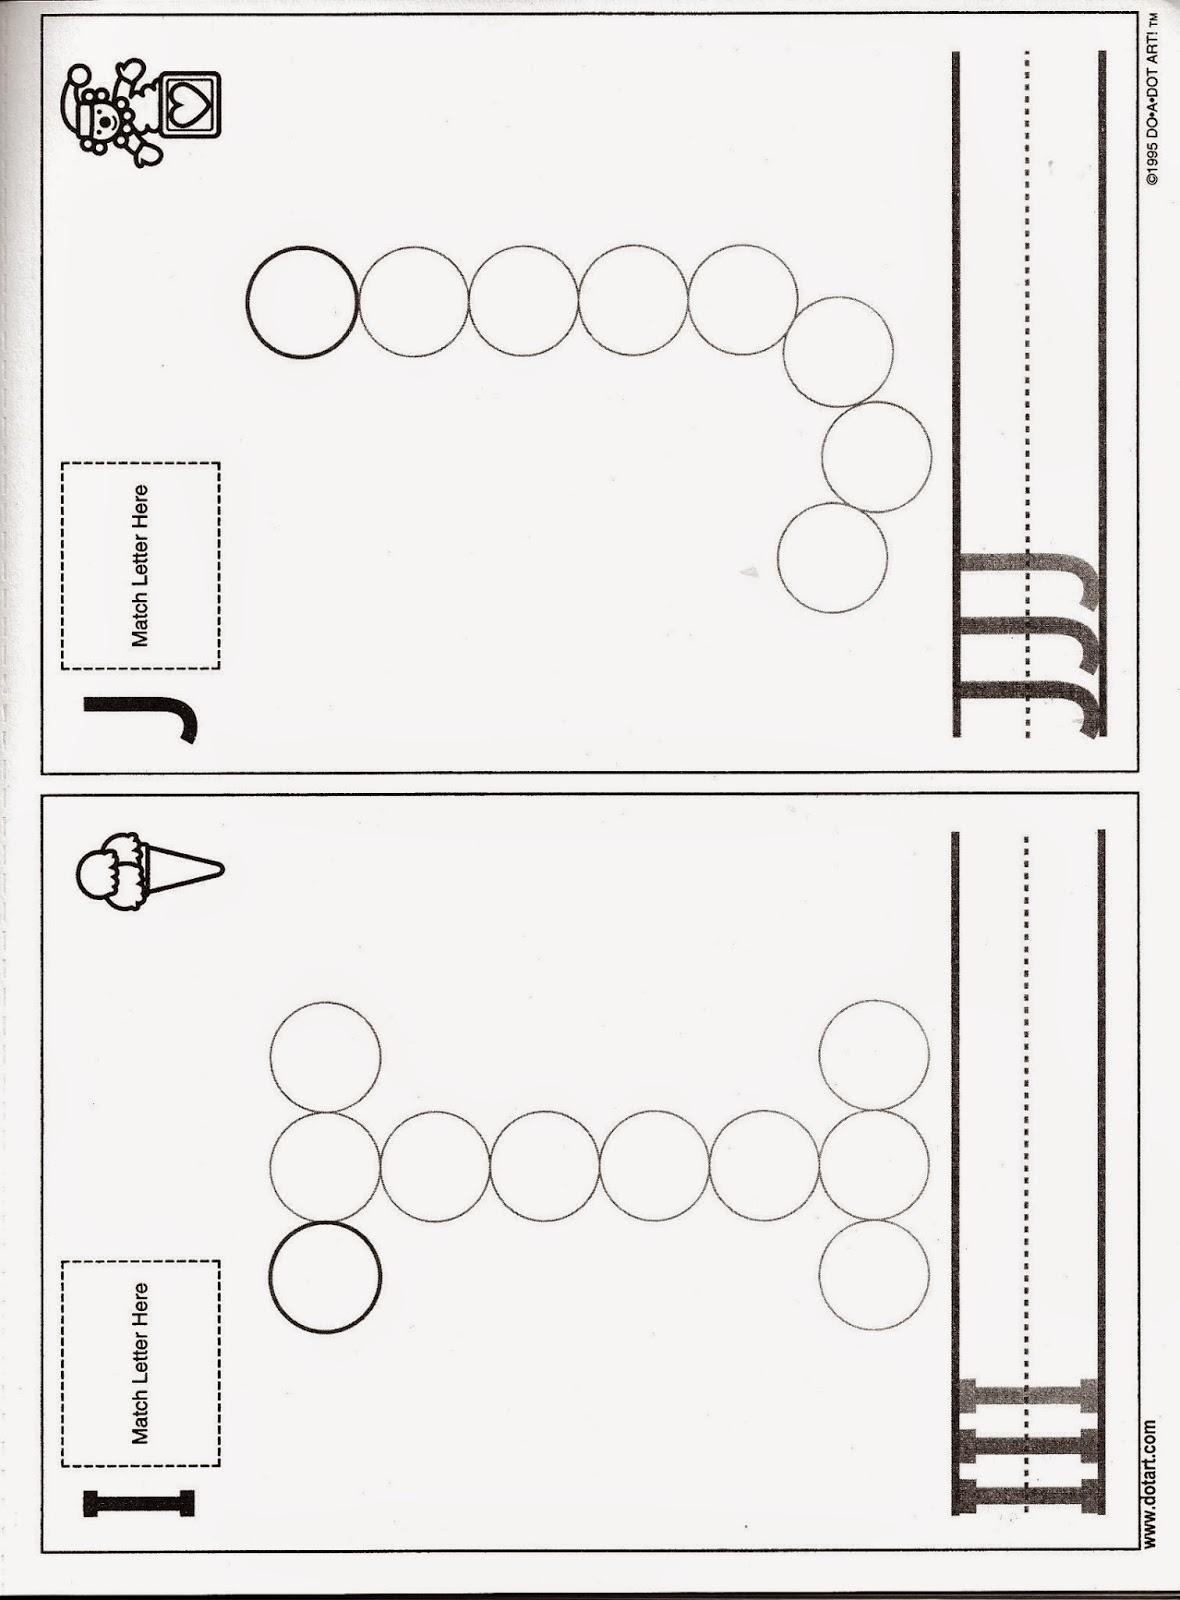 Elementary School Enrichment Activities Lesson 10